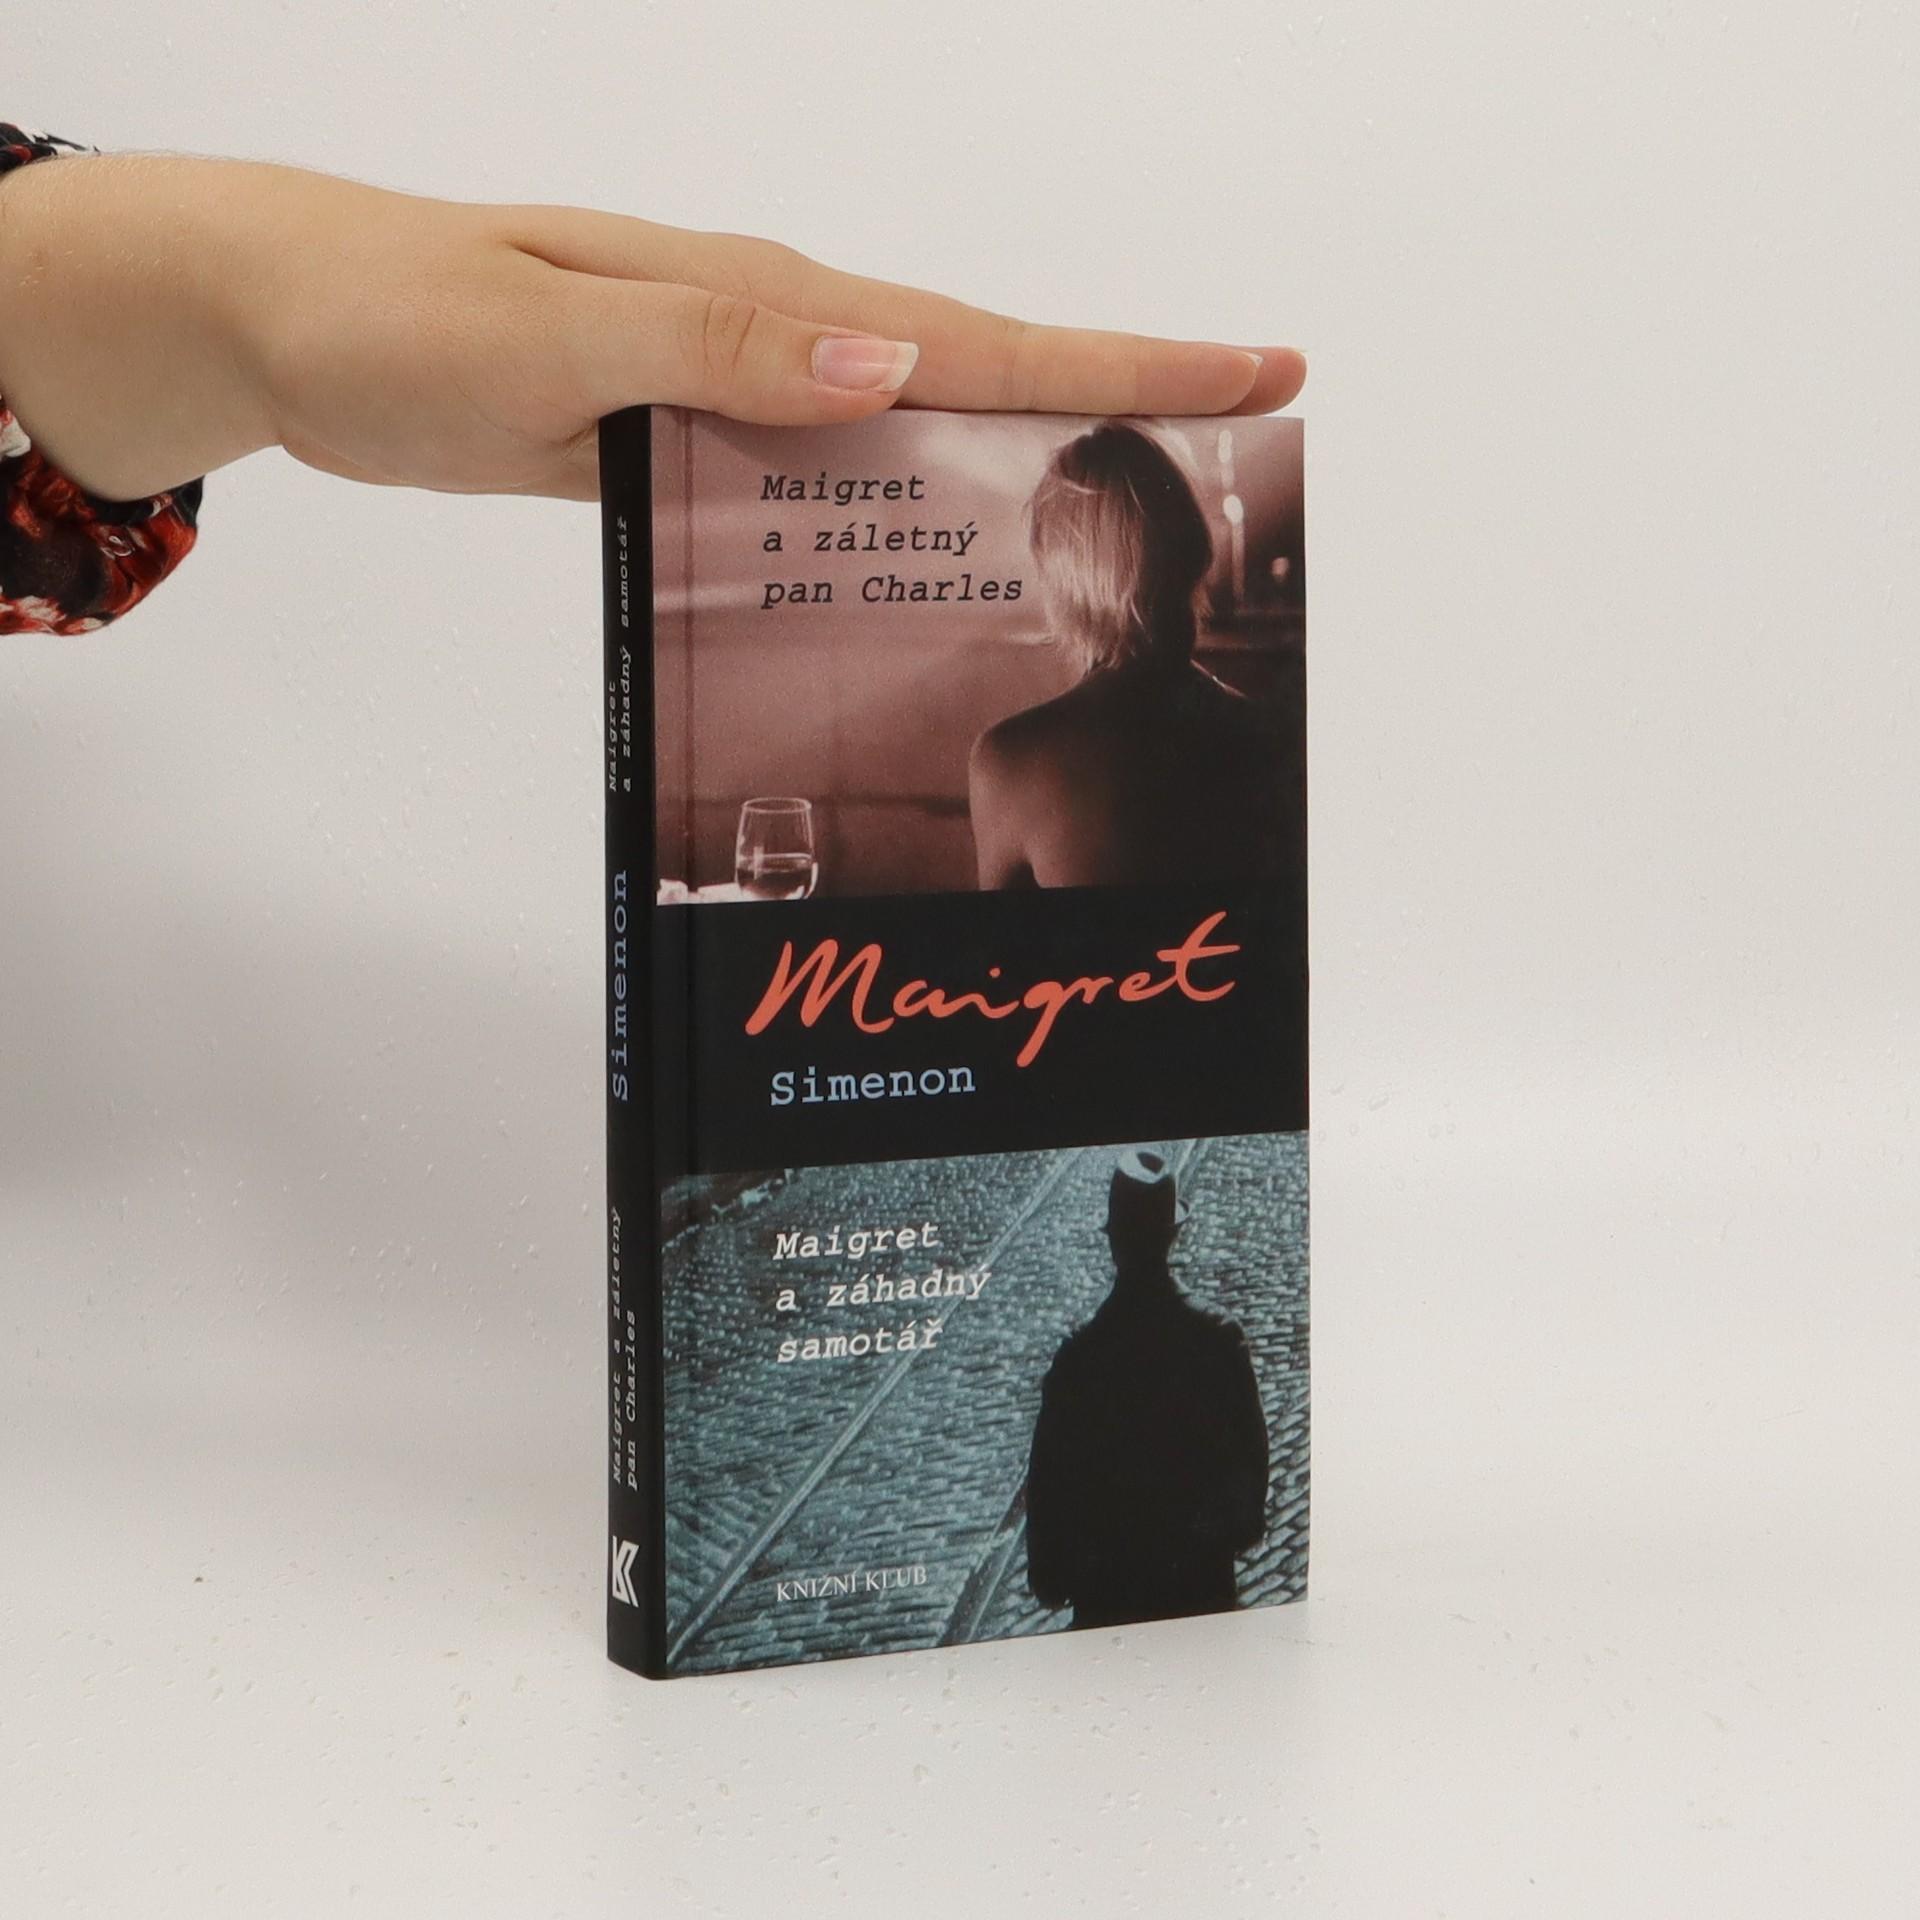 antikvární kniha Maigret a záletný pan Charles ; Maigret a záhadný samotář, 2004